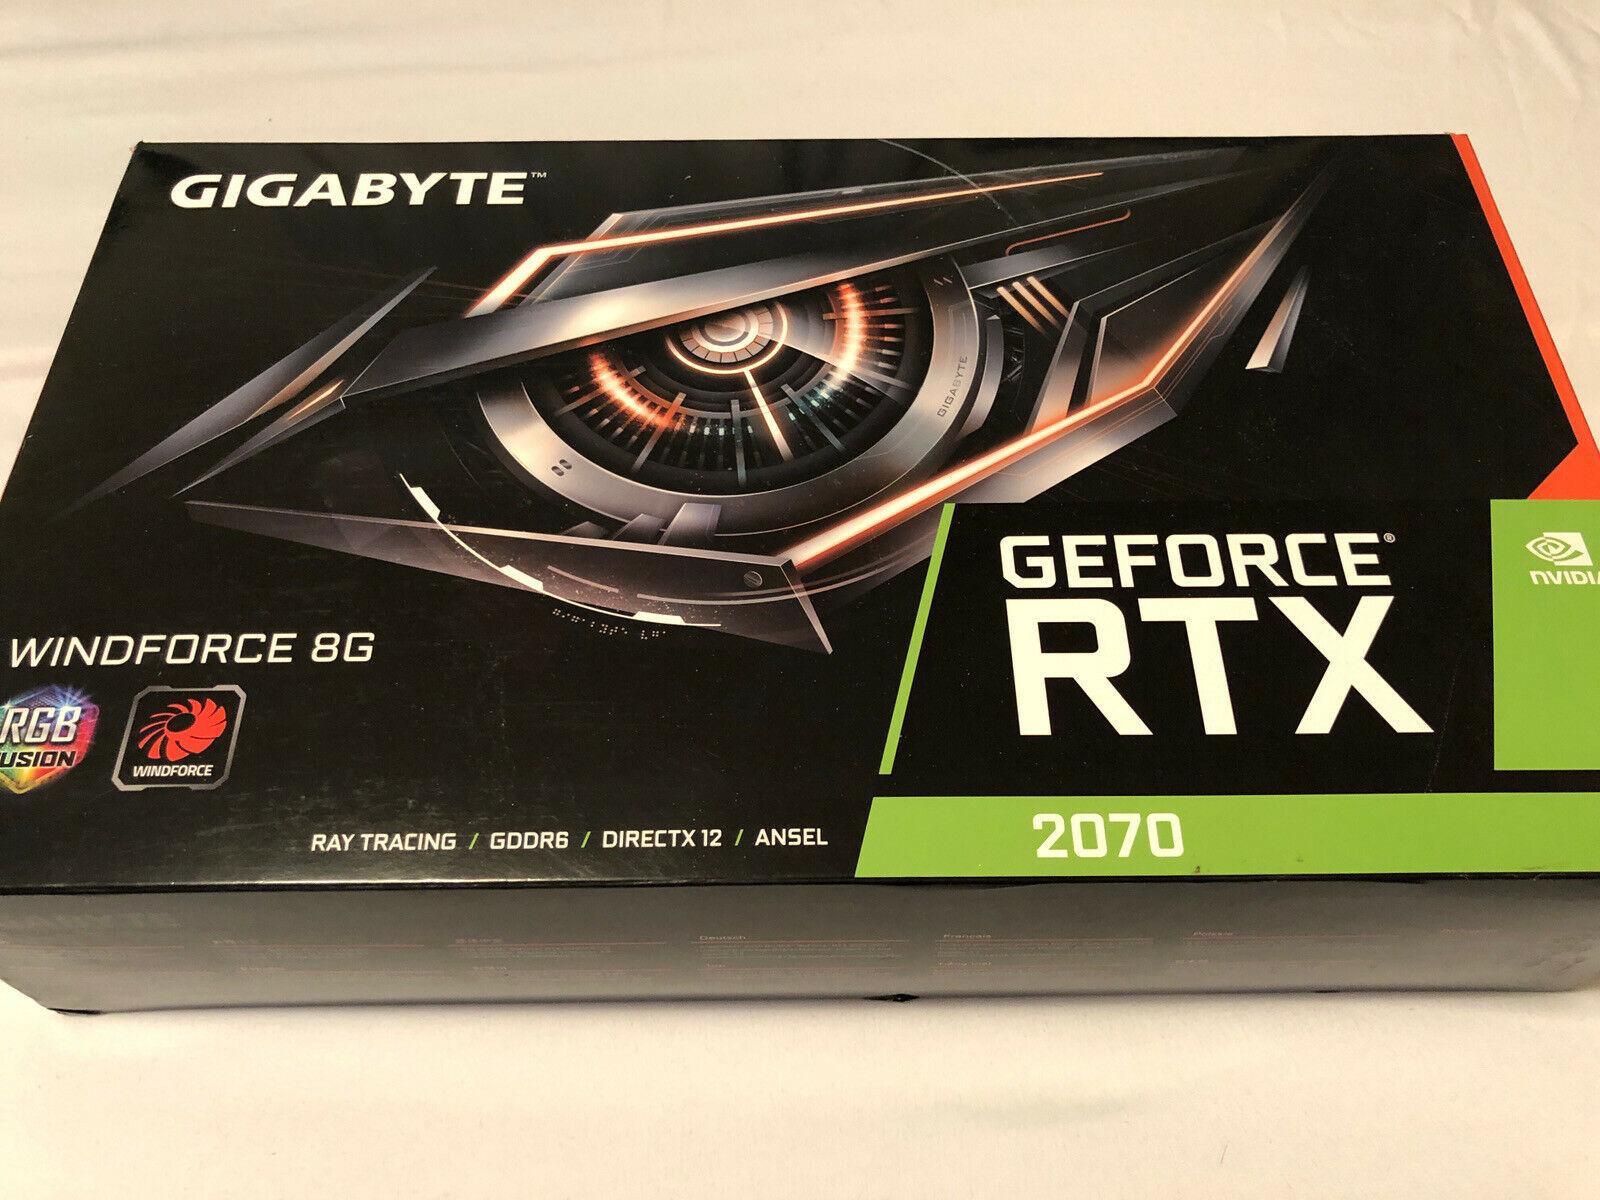 GIGABYTE GeForce RTX 2070 Windforce 8GB GDDR6 Graphics Card.....+14704086638